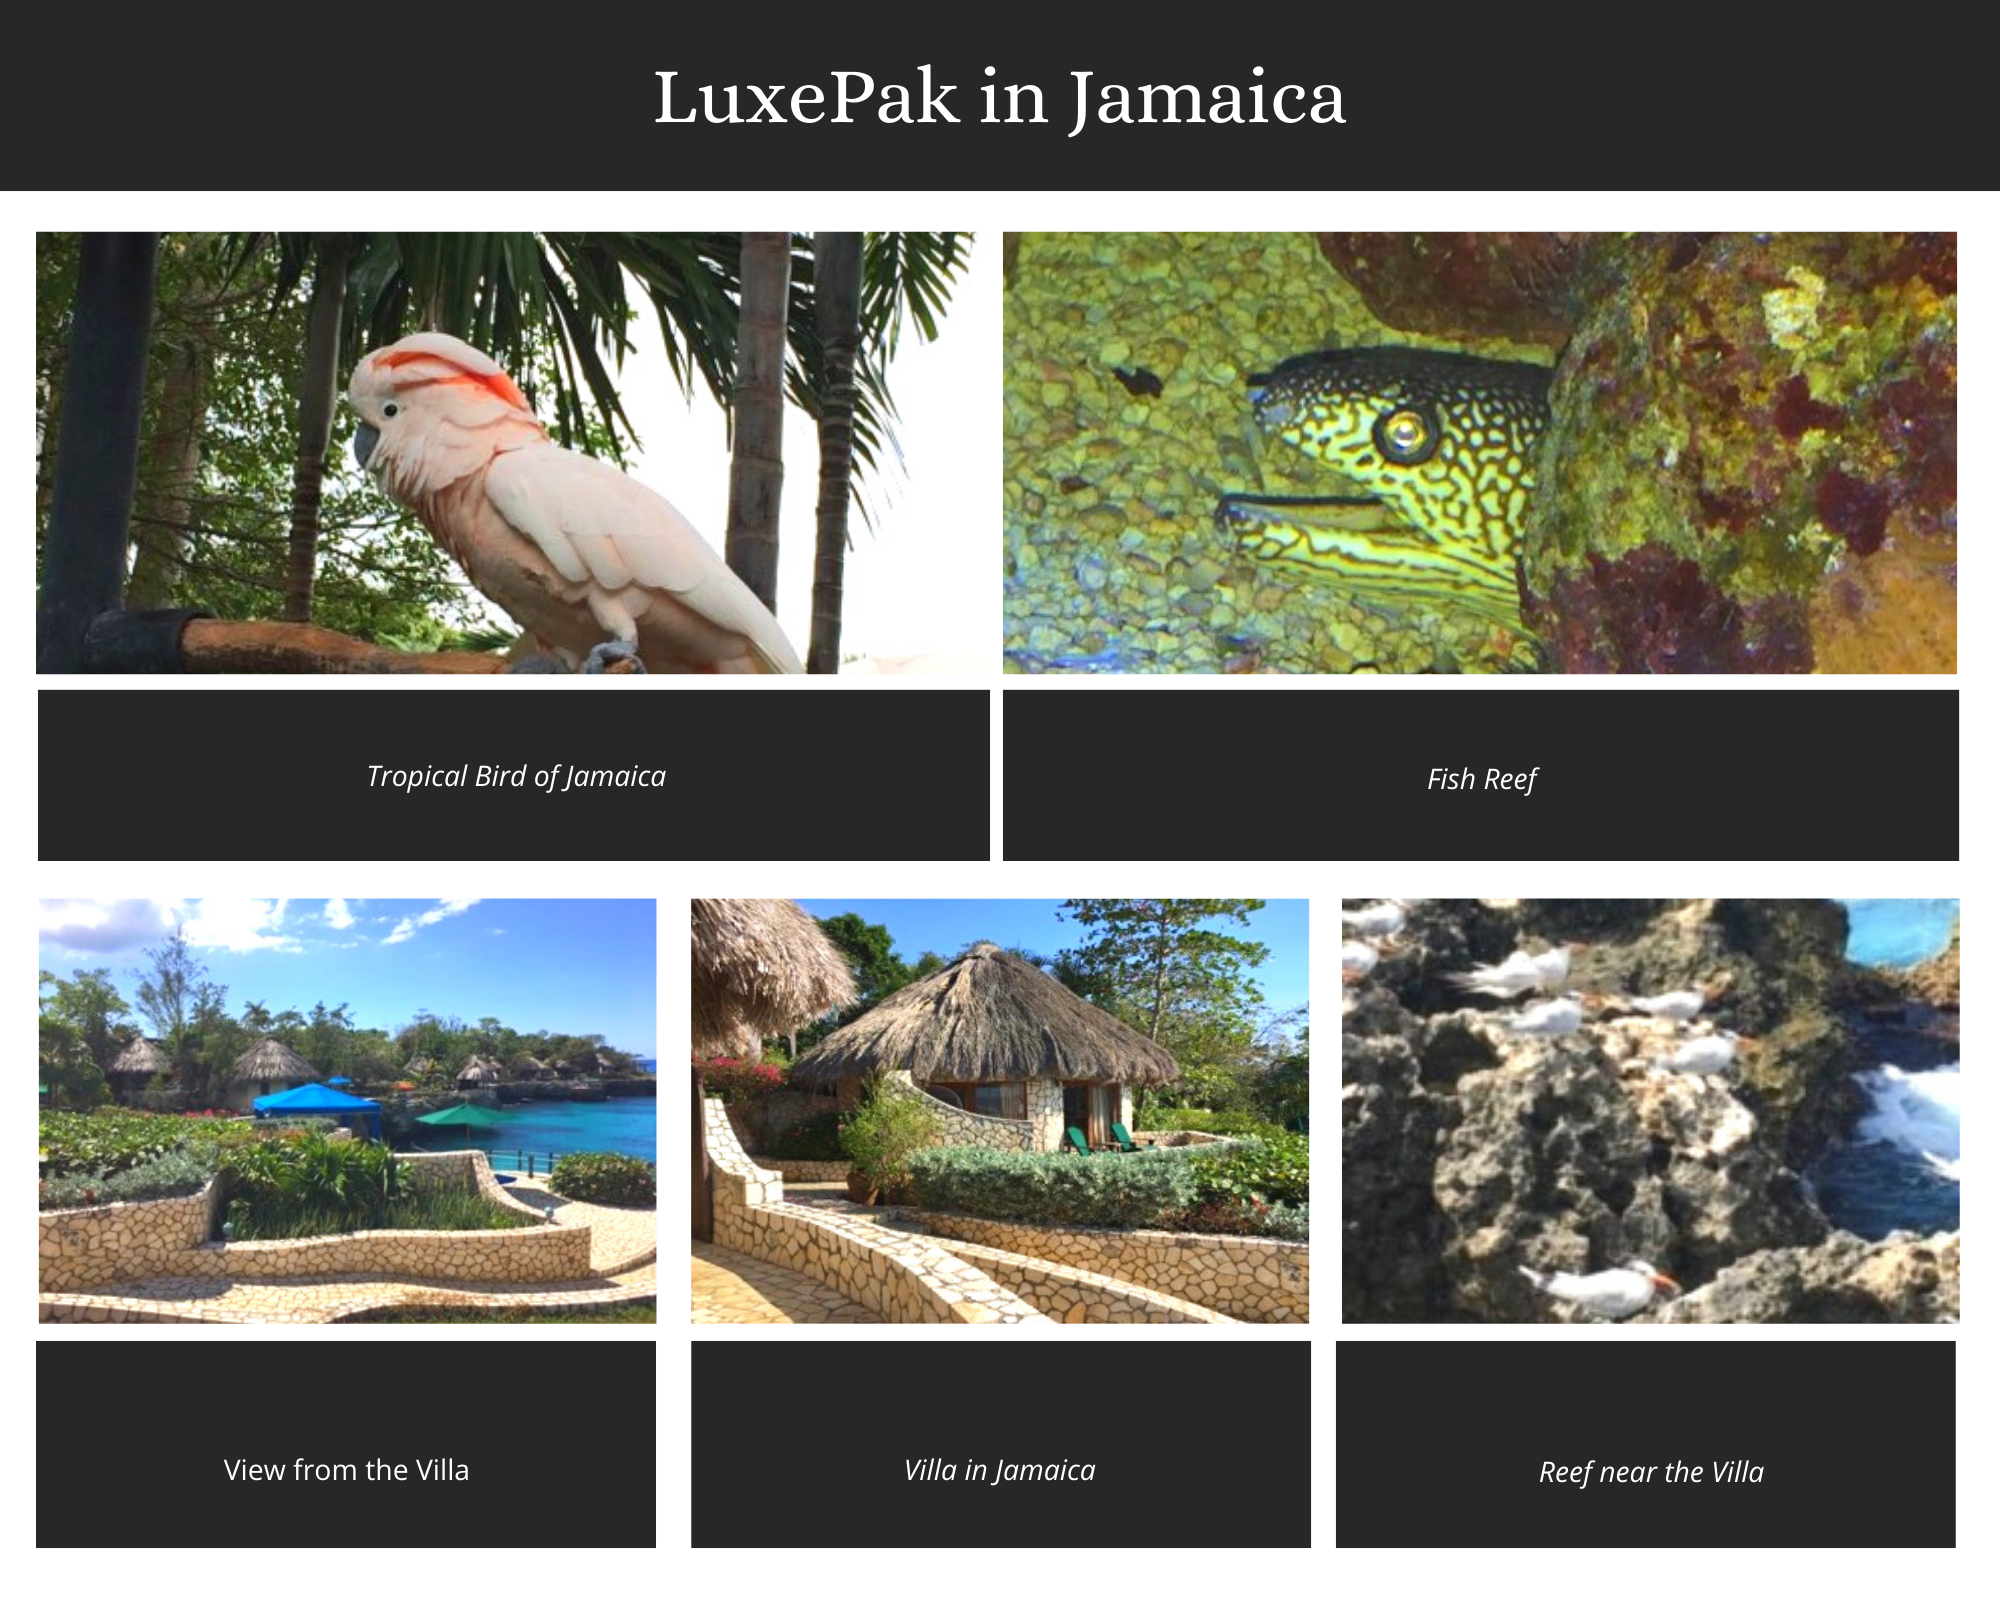 LuxePak Travels to Jamaica